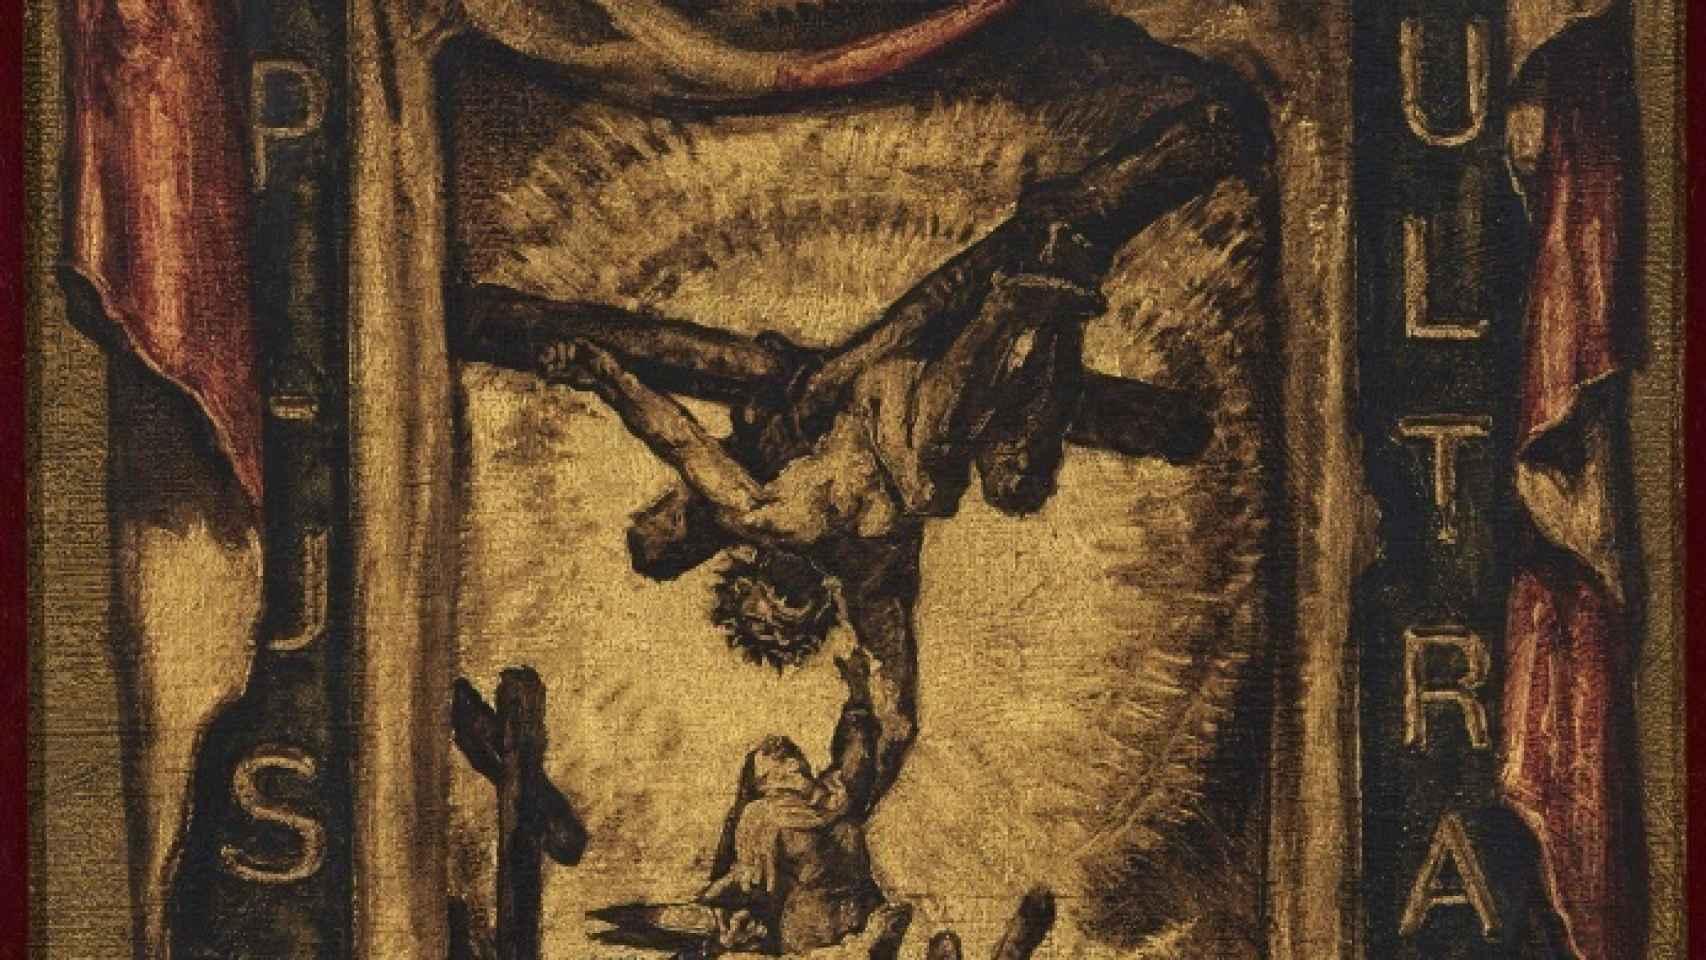 La pintura de Sert, Intercesión de Santa Teresa de Jesús en la Guerra Civil española.